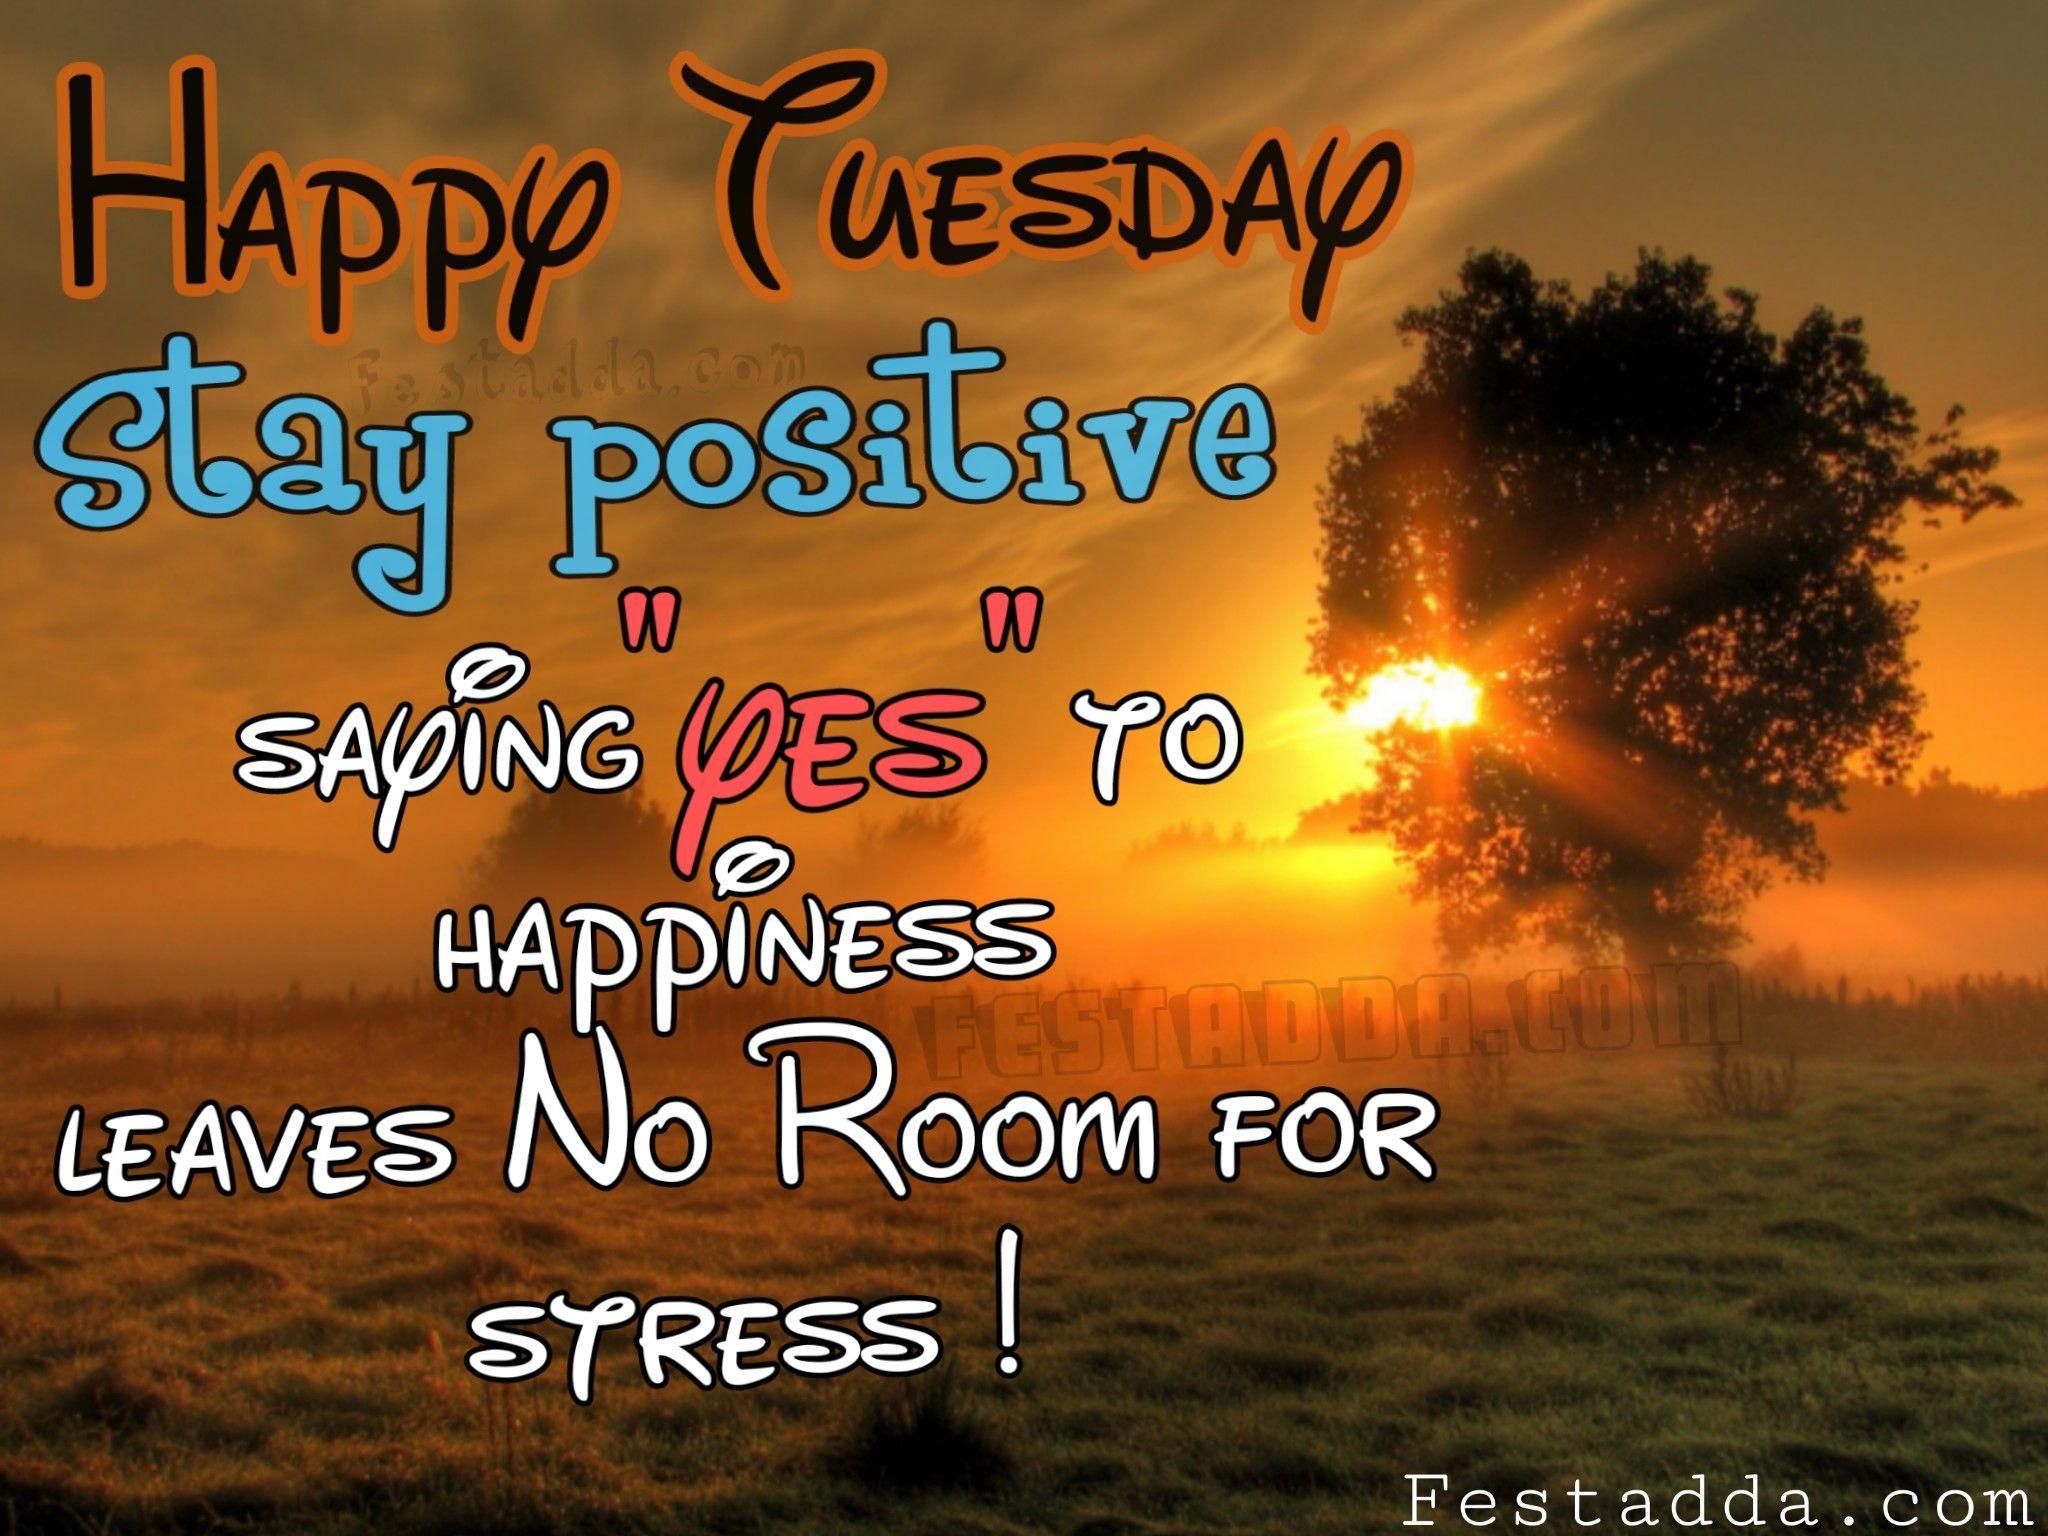 Happy Tuesday Morning Happy Tuesday Morning Good Morning Tuesday Wishes Good Morning Tuesday Images Happy Tuesday Morning